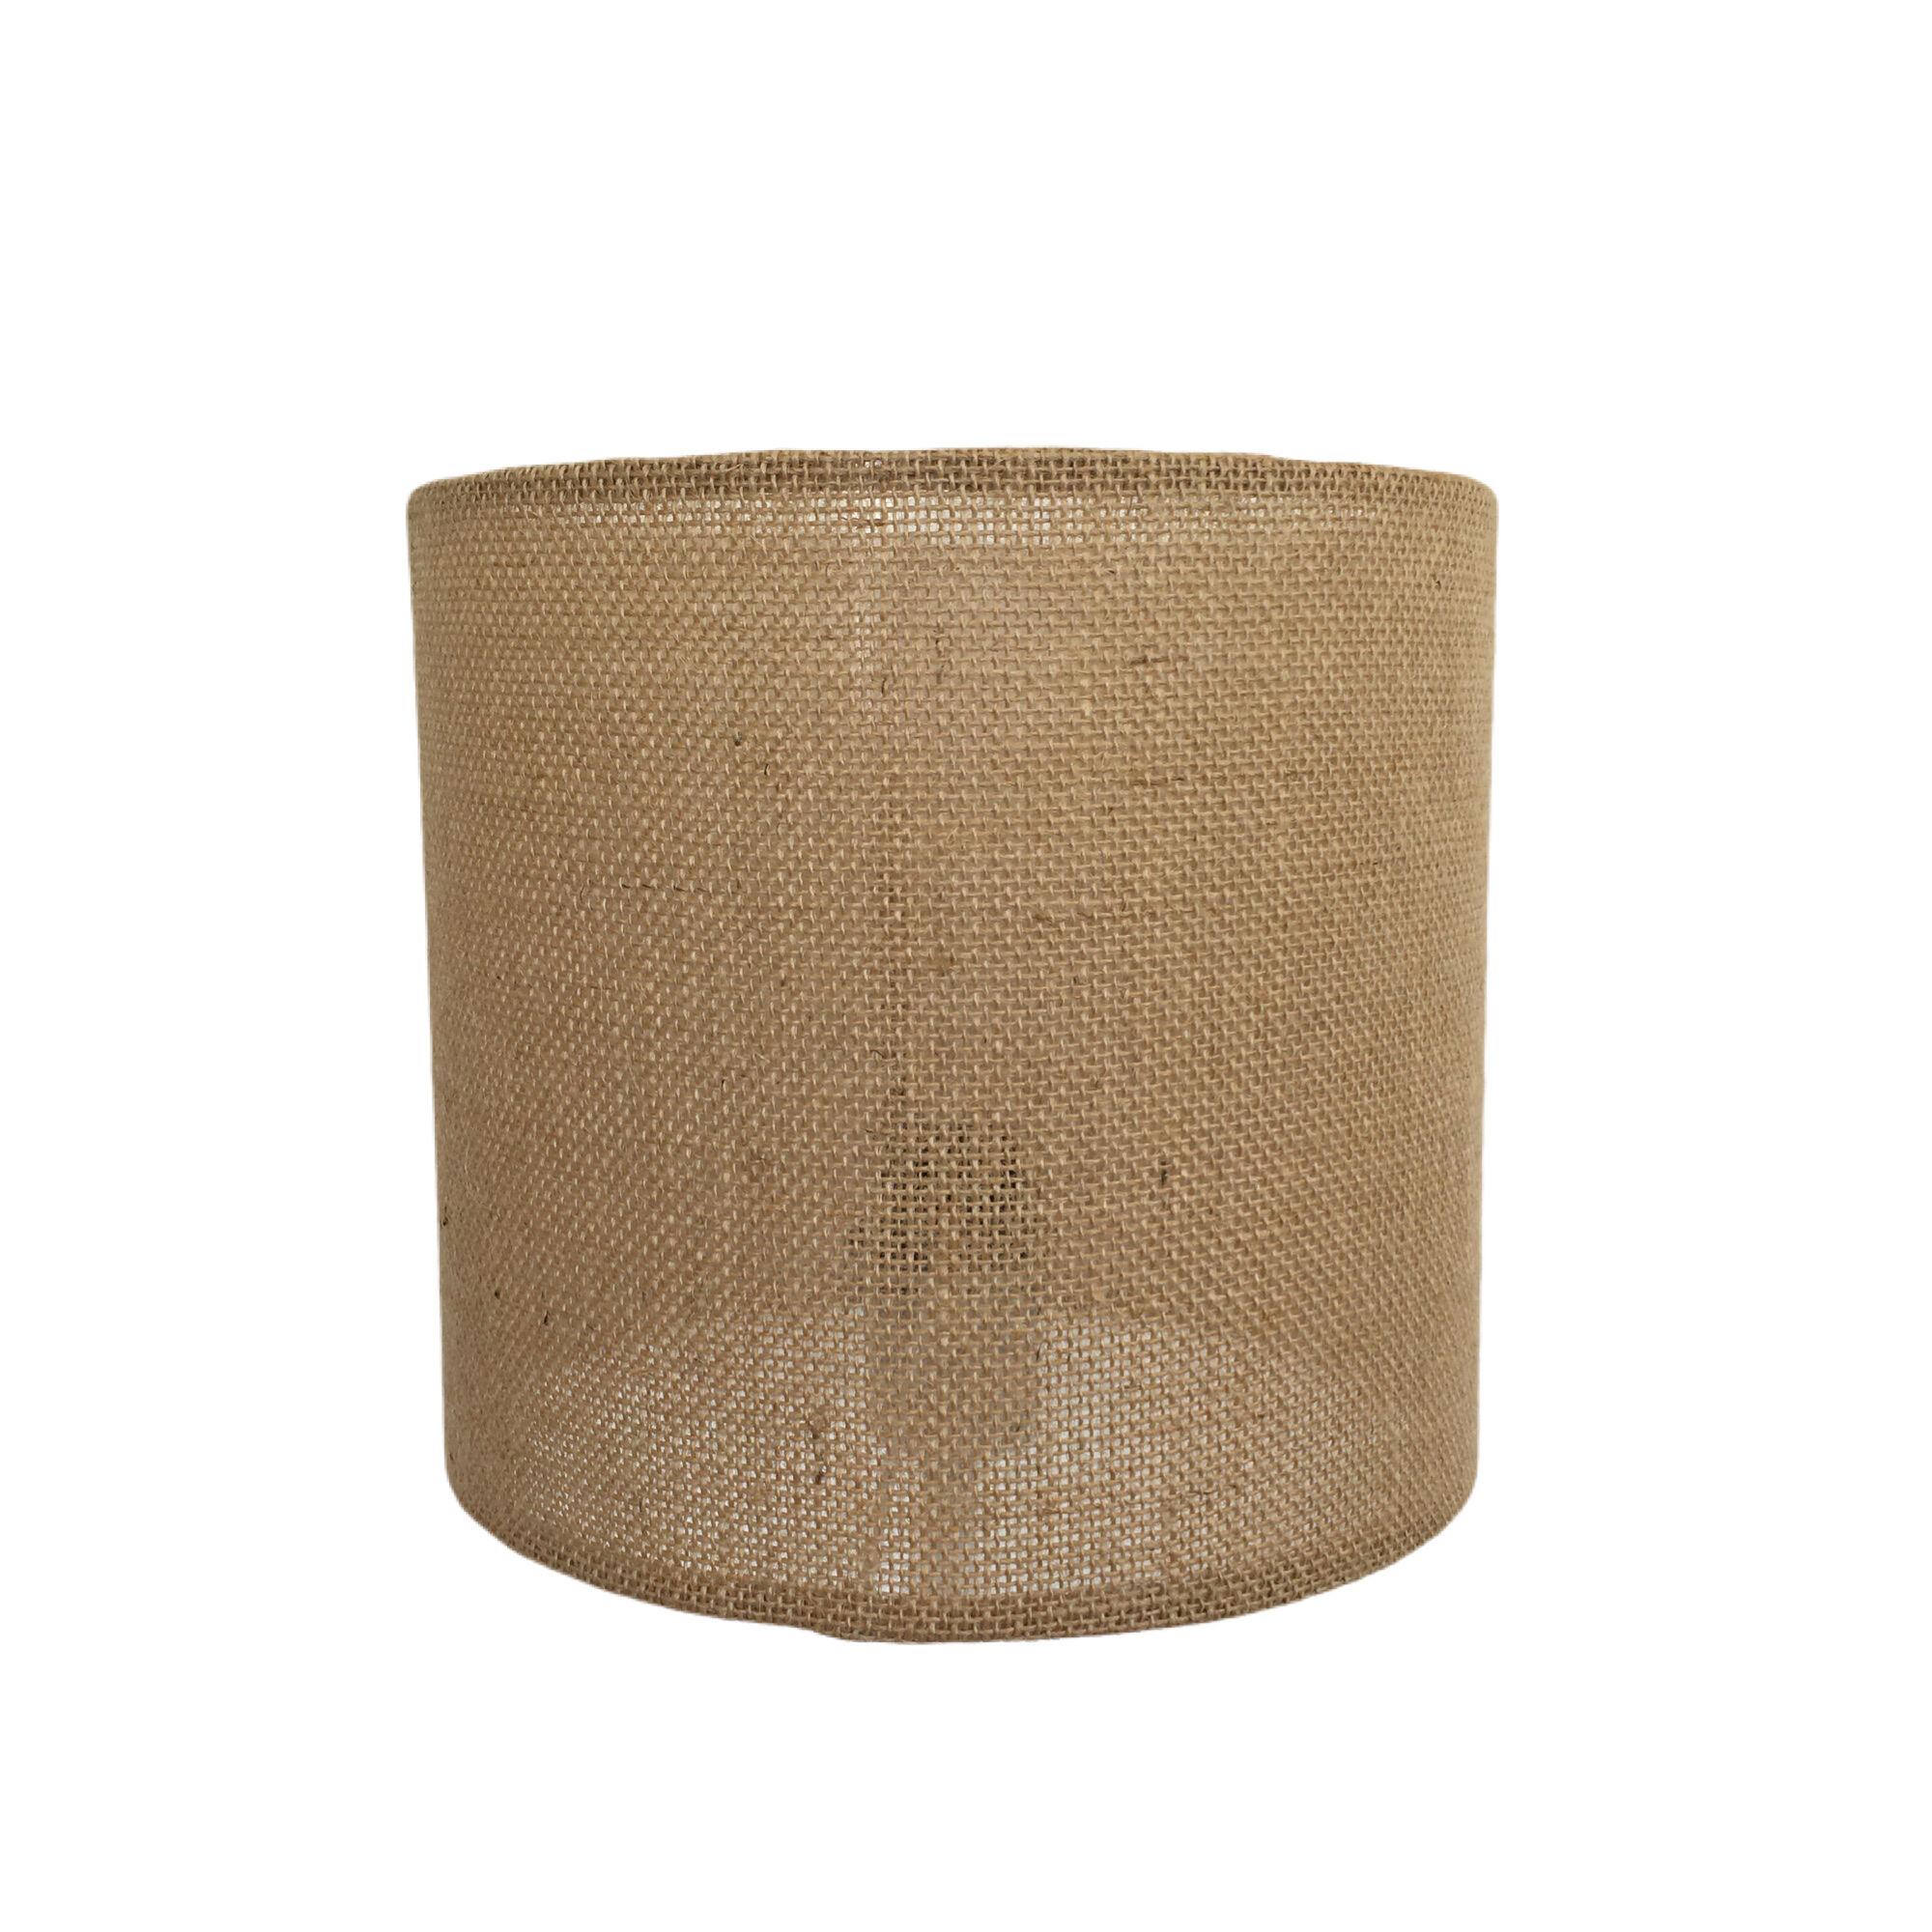 Belamp Suspension toile de jute diamètre 15 cm